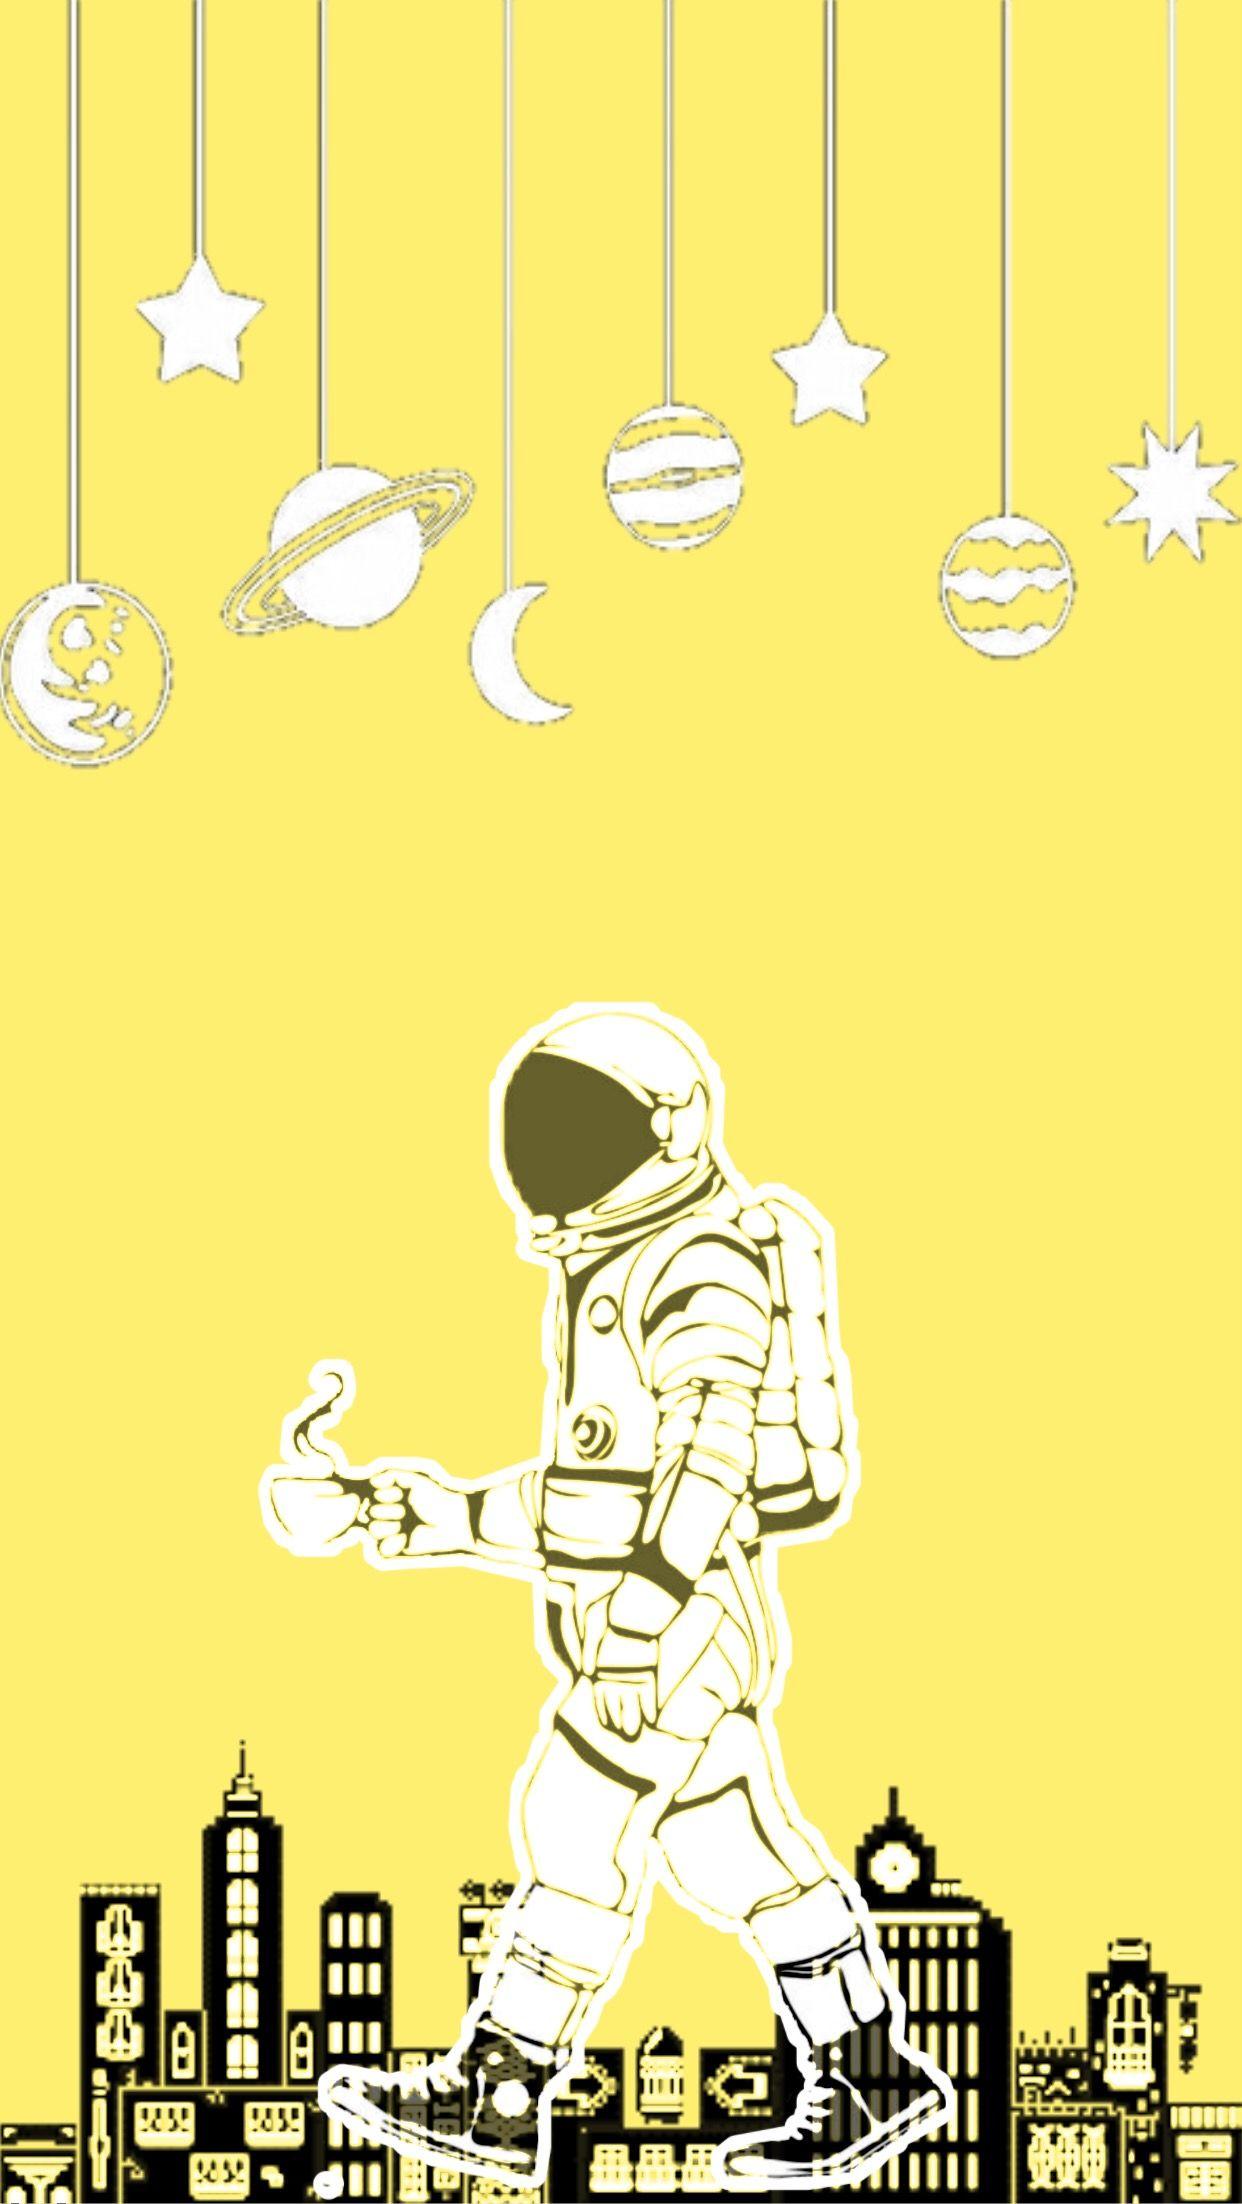 Yellow Lockscreen Wallpaper Background Astronaut Space City Aesthetic Yellow Aesthetic Pastel Astronaut Wallpaper Artsy Background